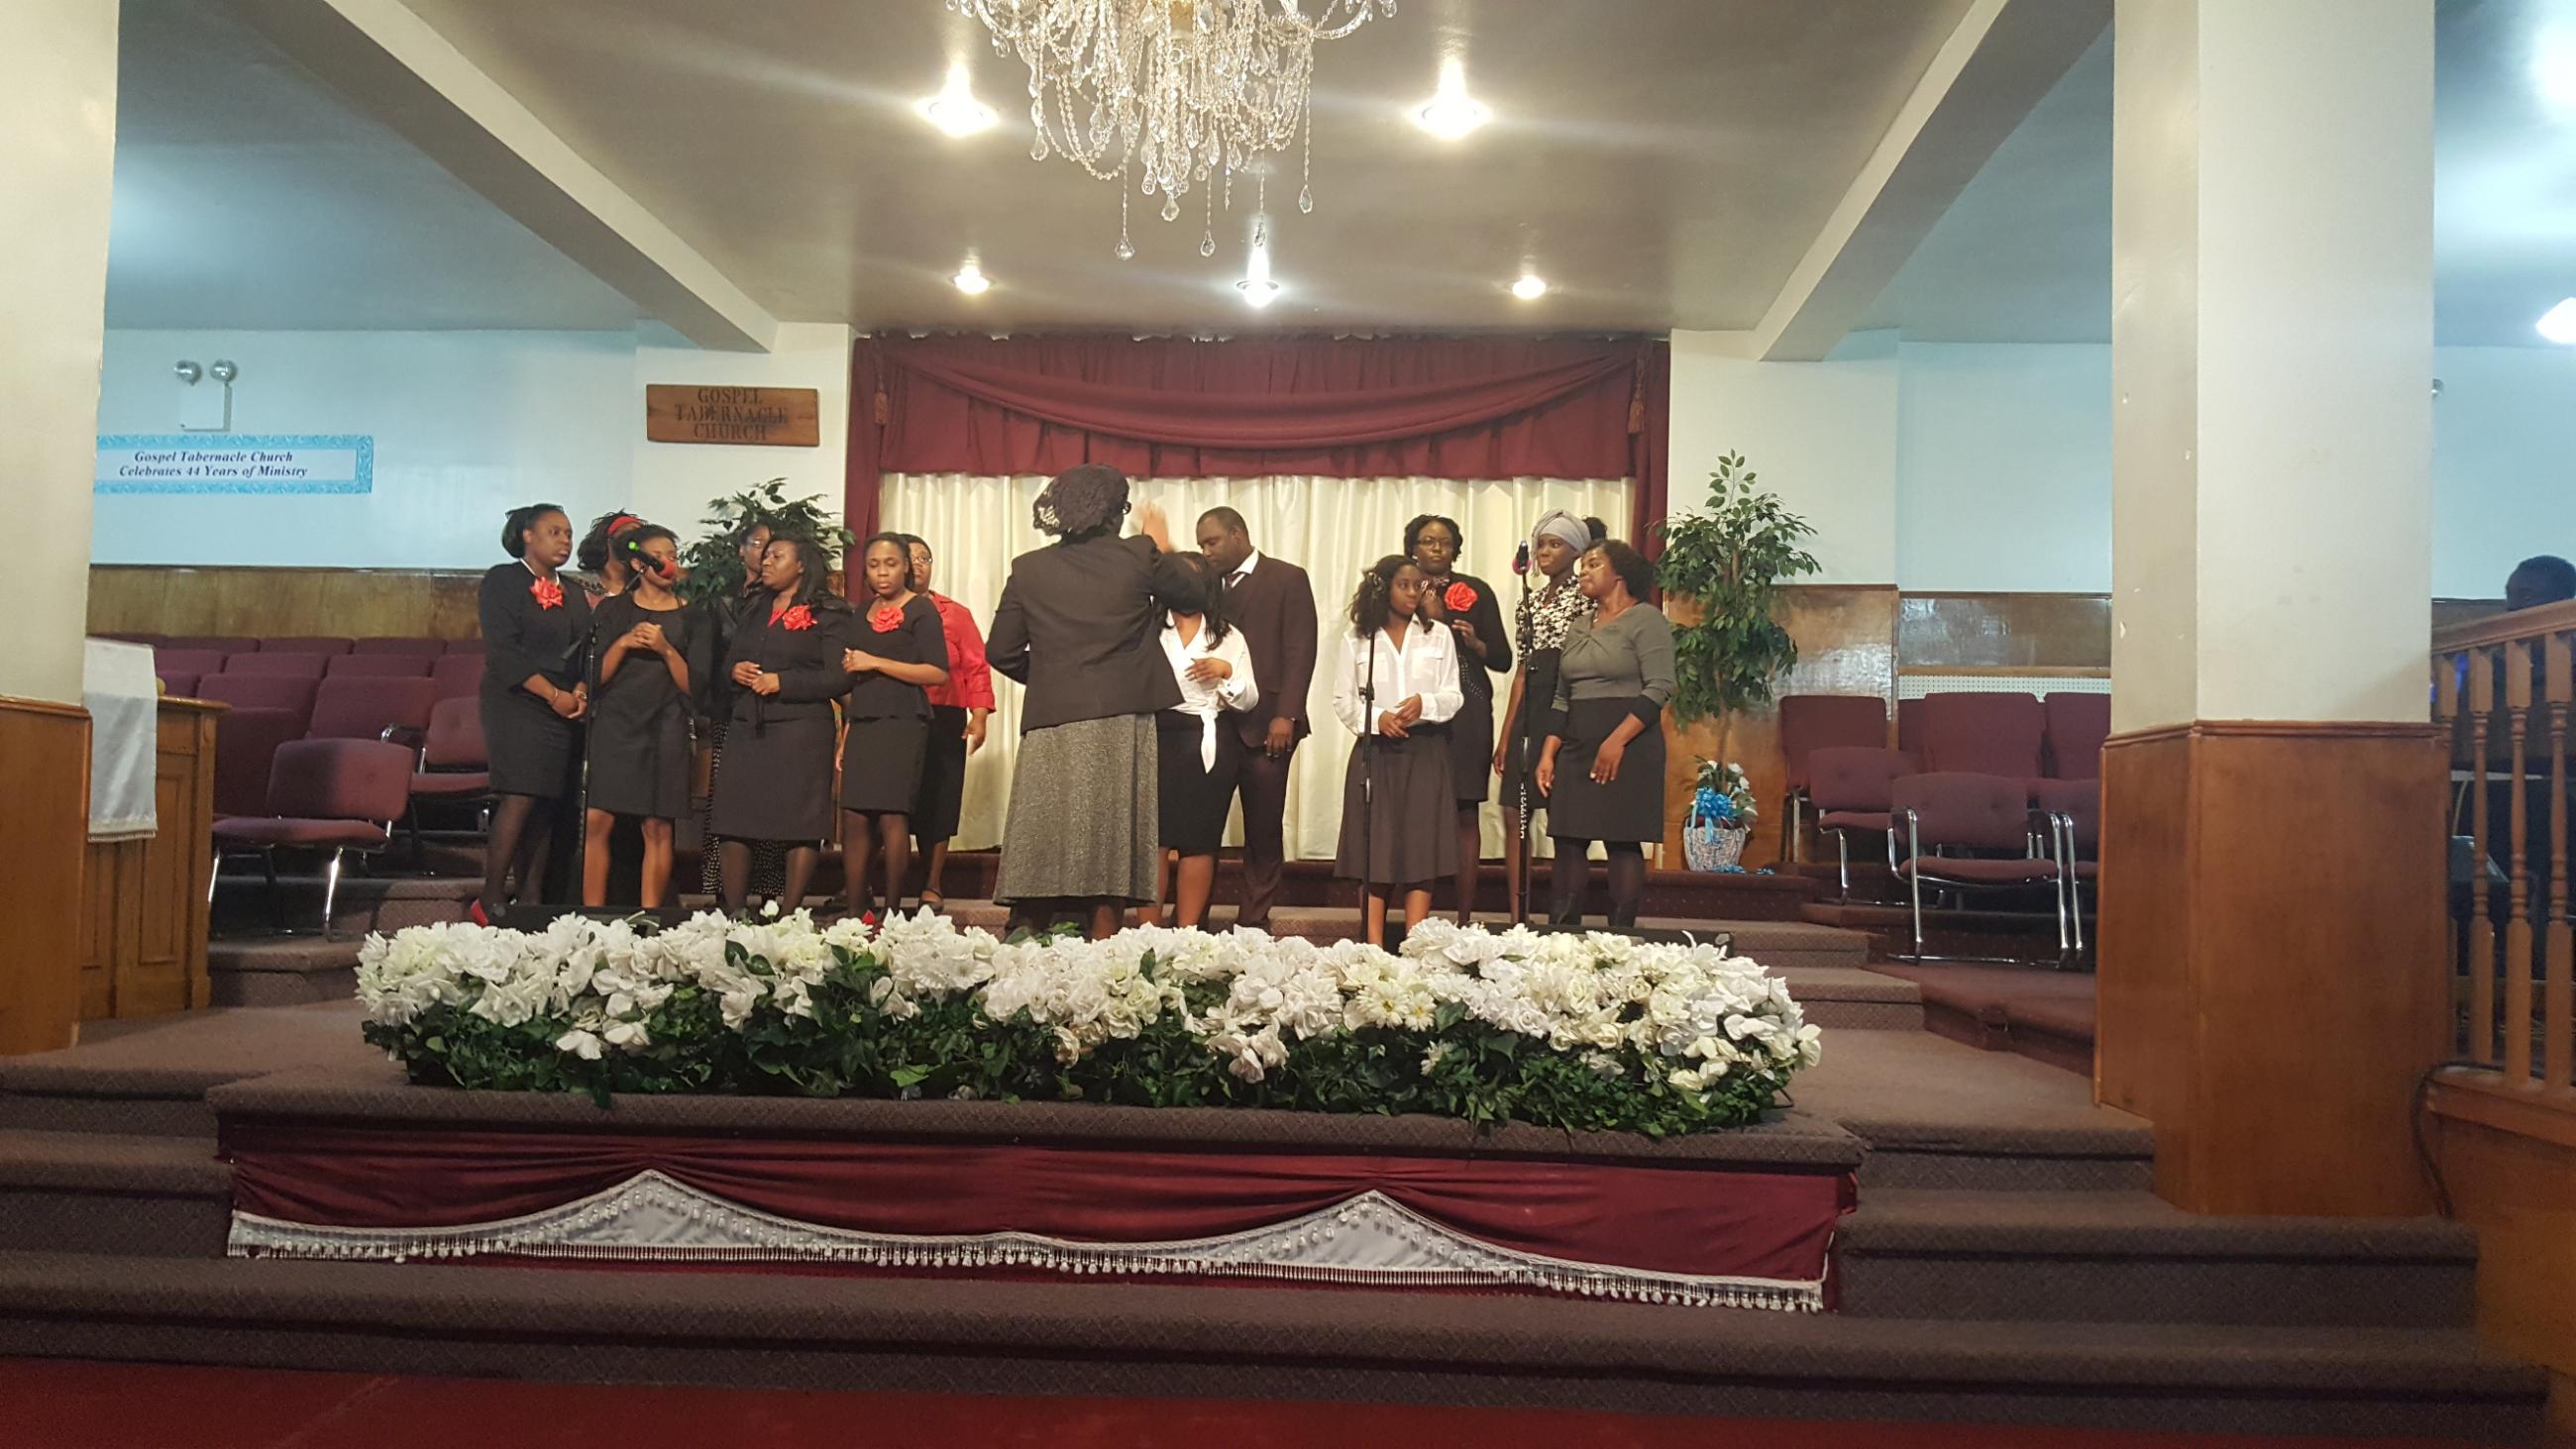 Apostolic Music Ministry - Apostolic Voice